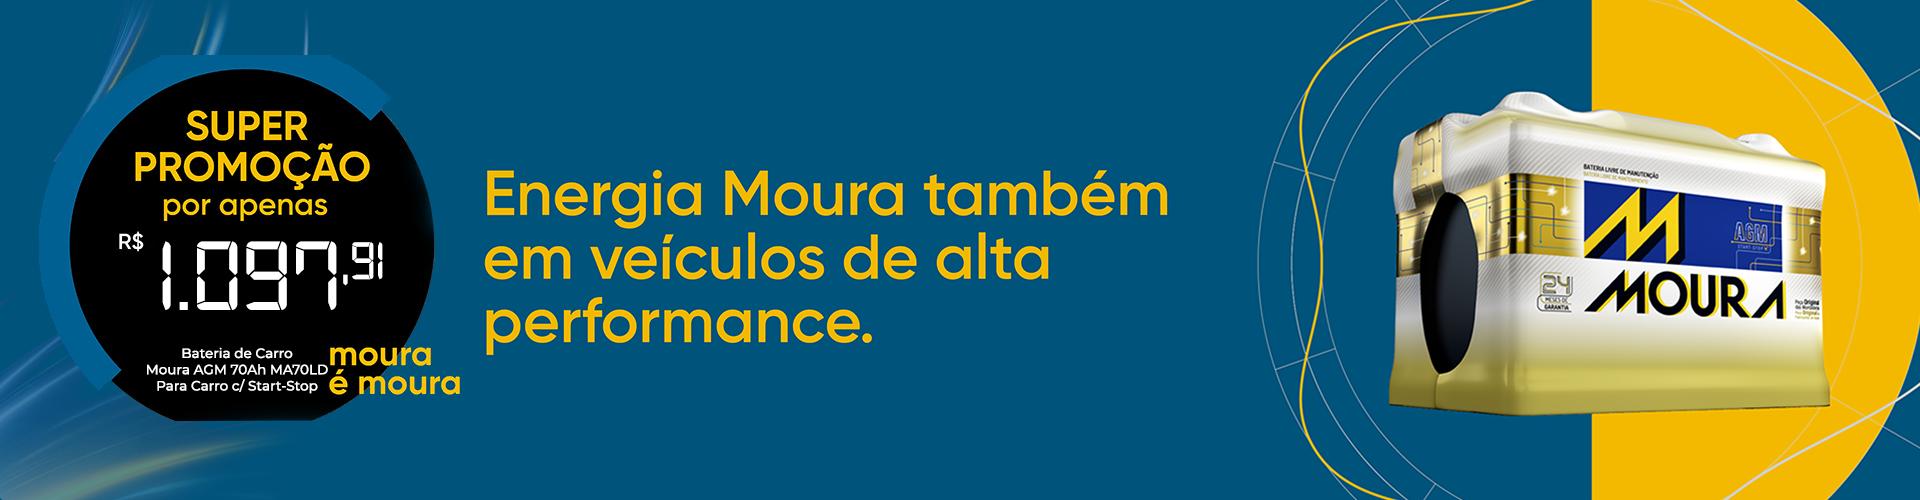 banner-moura-agm-novo